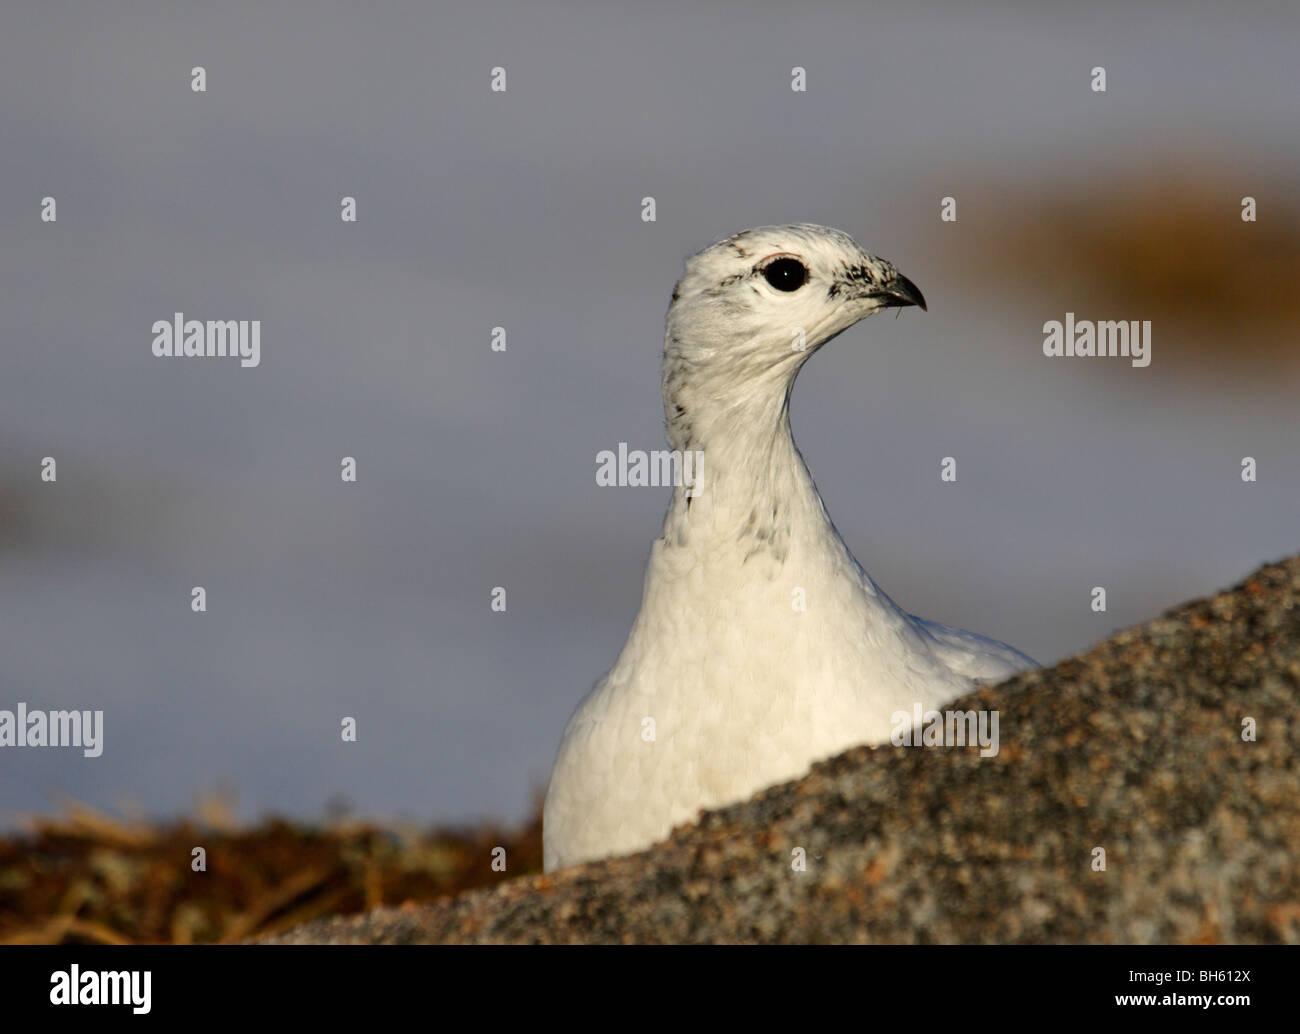 Ptarmigan (Lagopus mutus) in winter plumage peering from behind rock in morning sunlight. - Stock Image